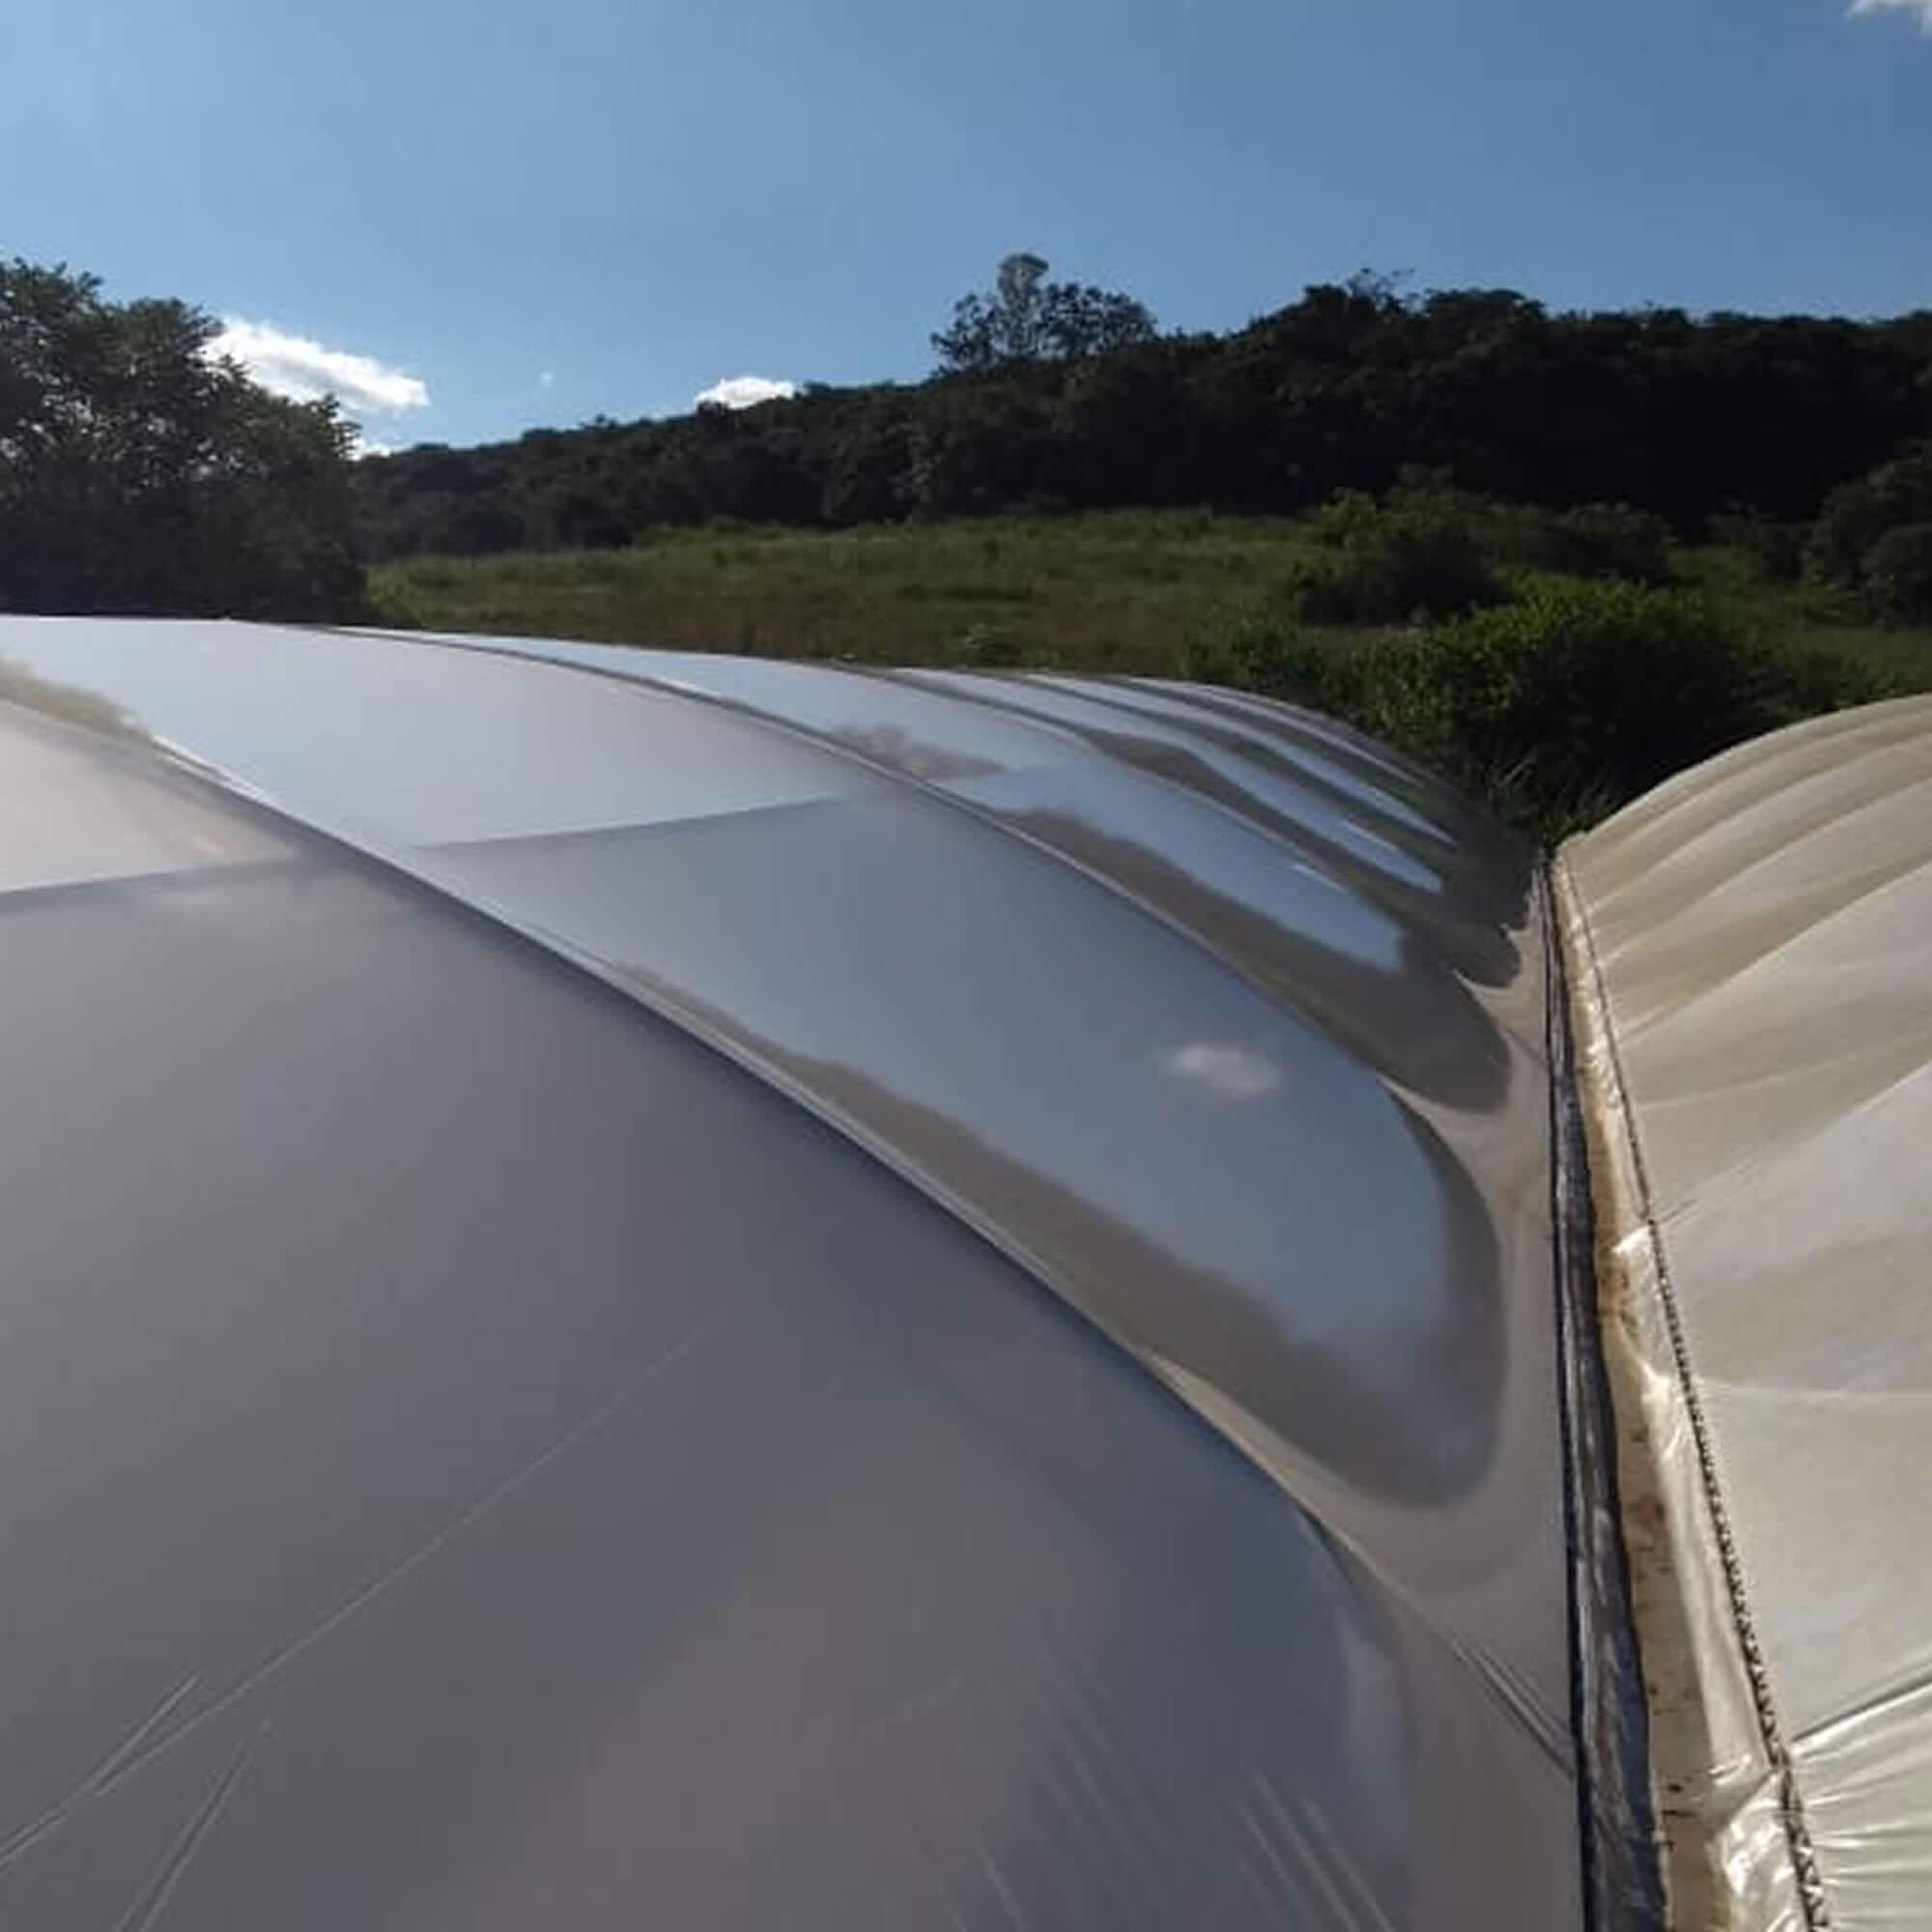 Filme Plástico Difusor para Estufa - 4 metros - 120 micras - Politiv